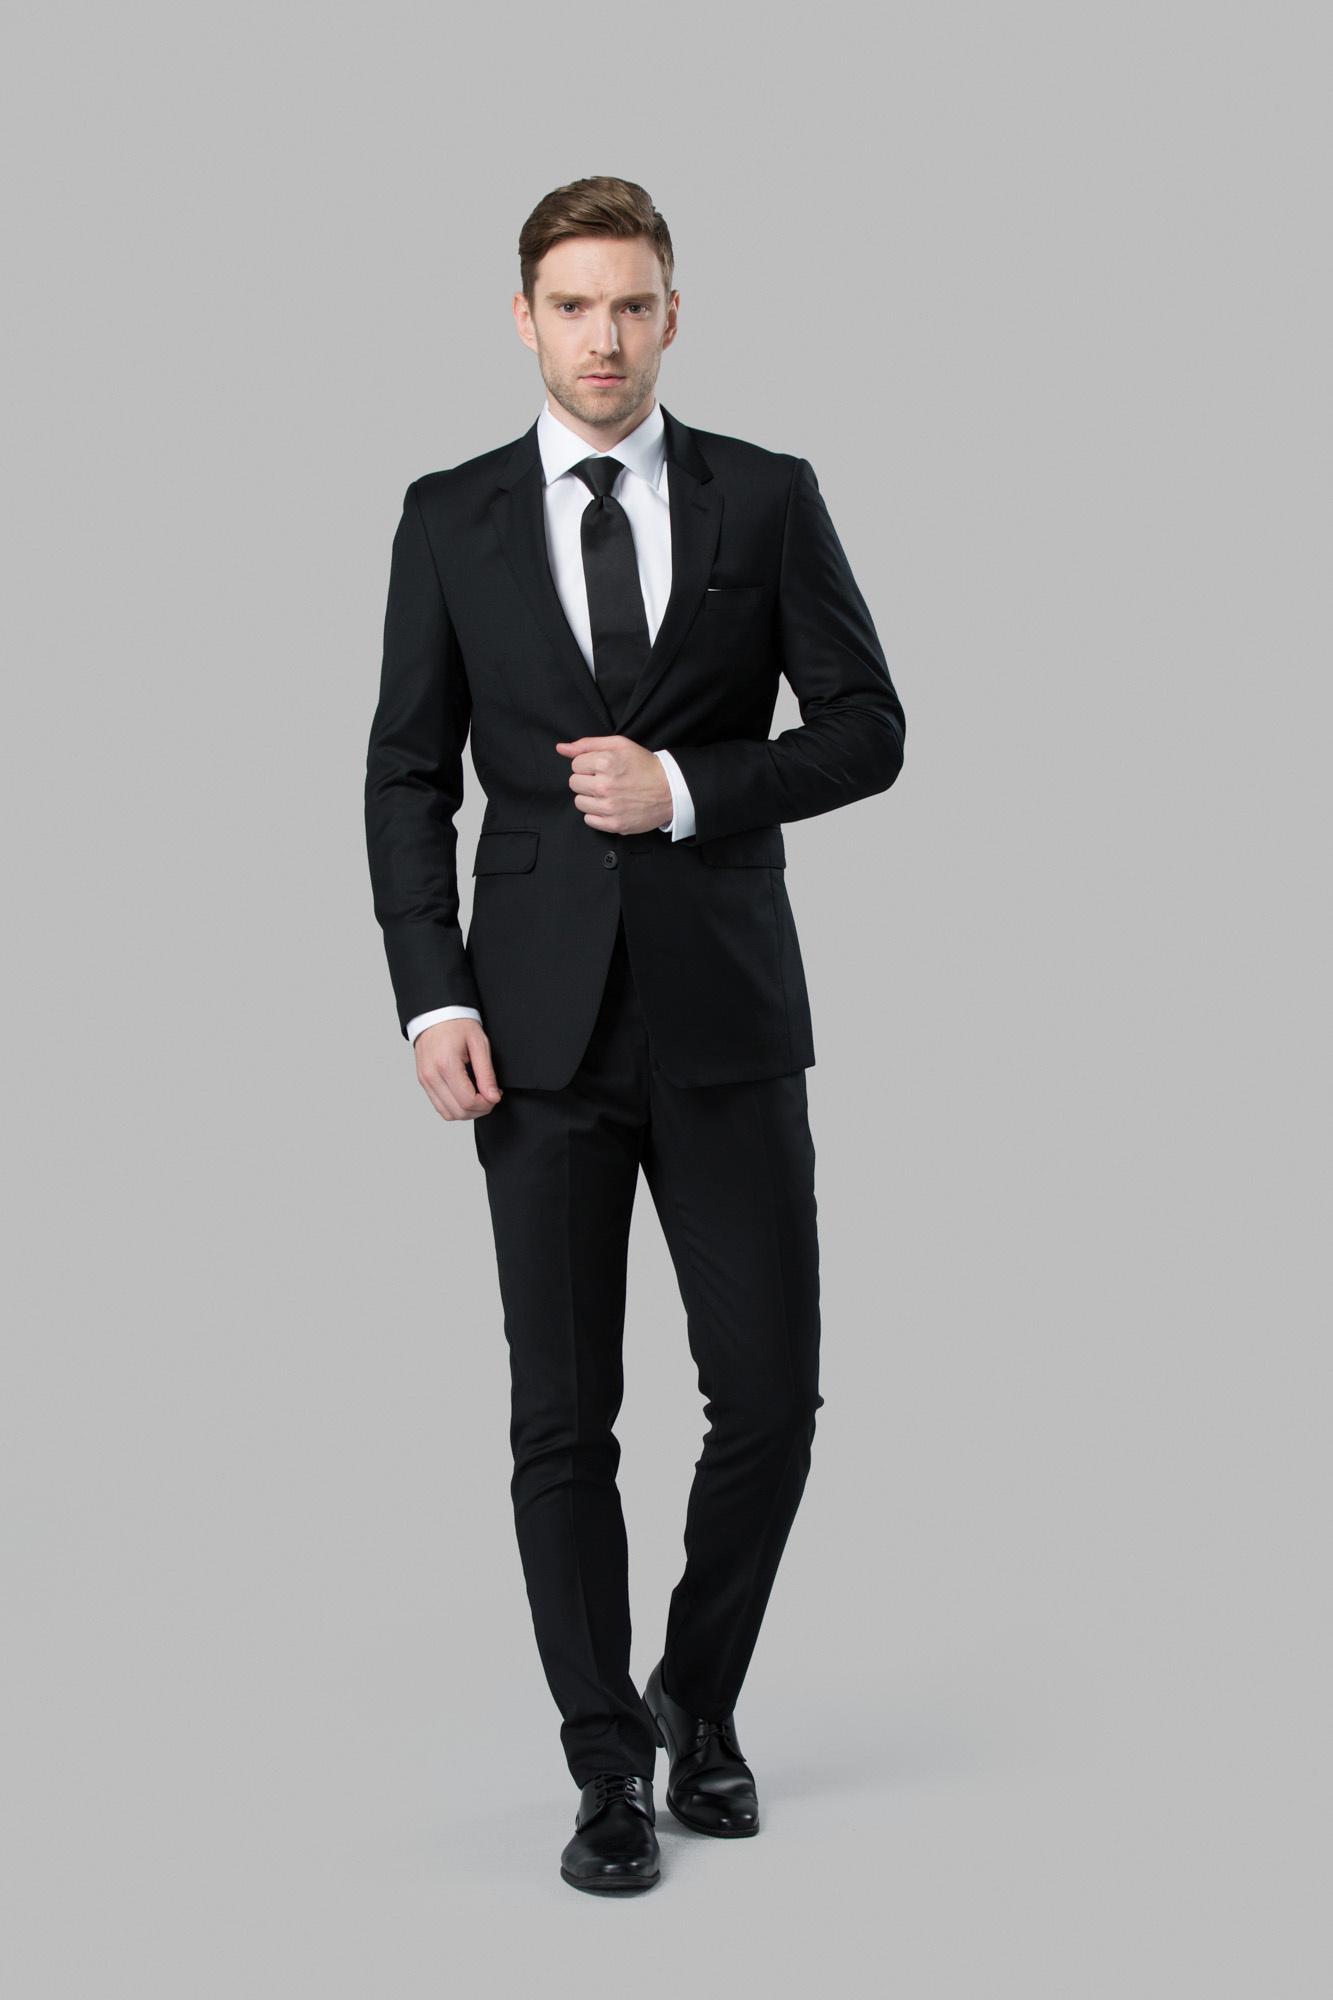 Custom Black Wedding Suit | Michael Kors Suit Rental | Menguin